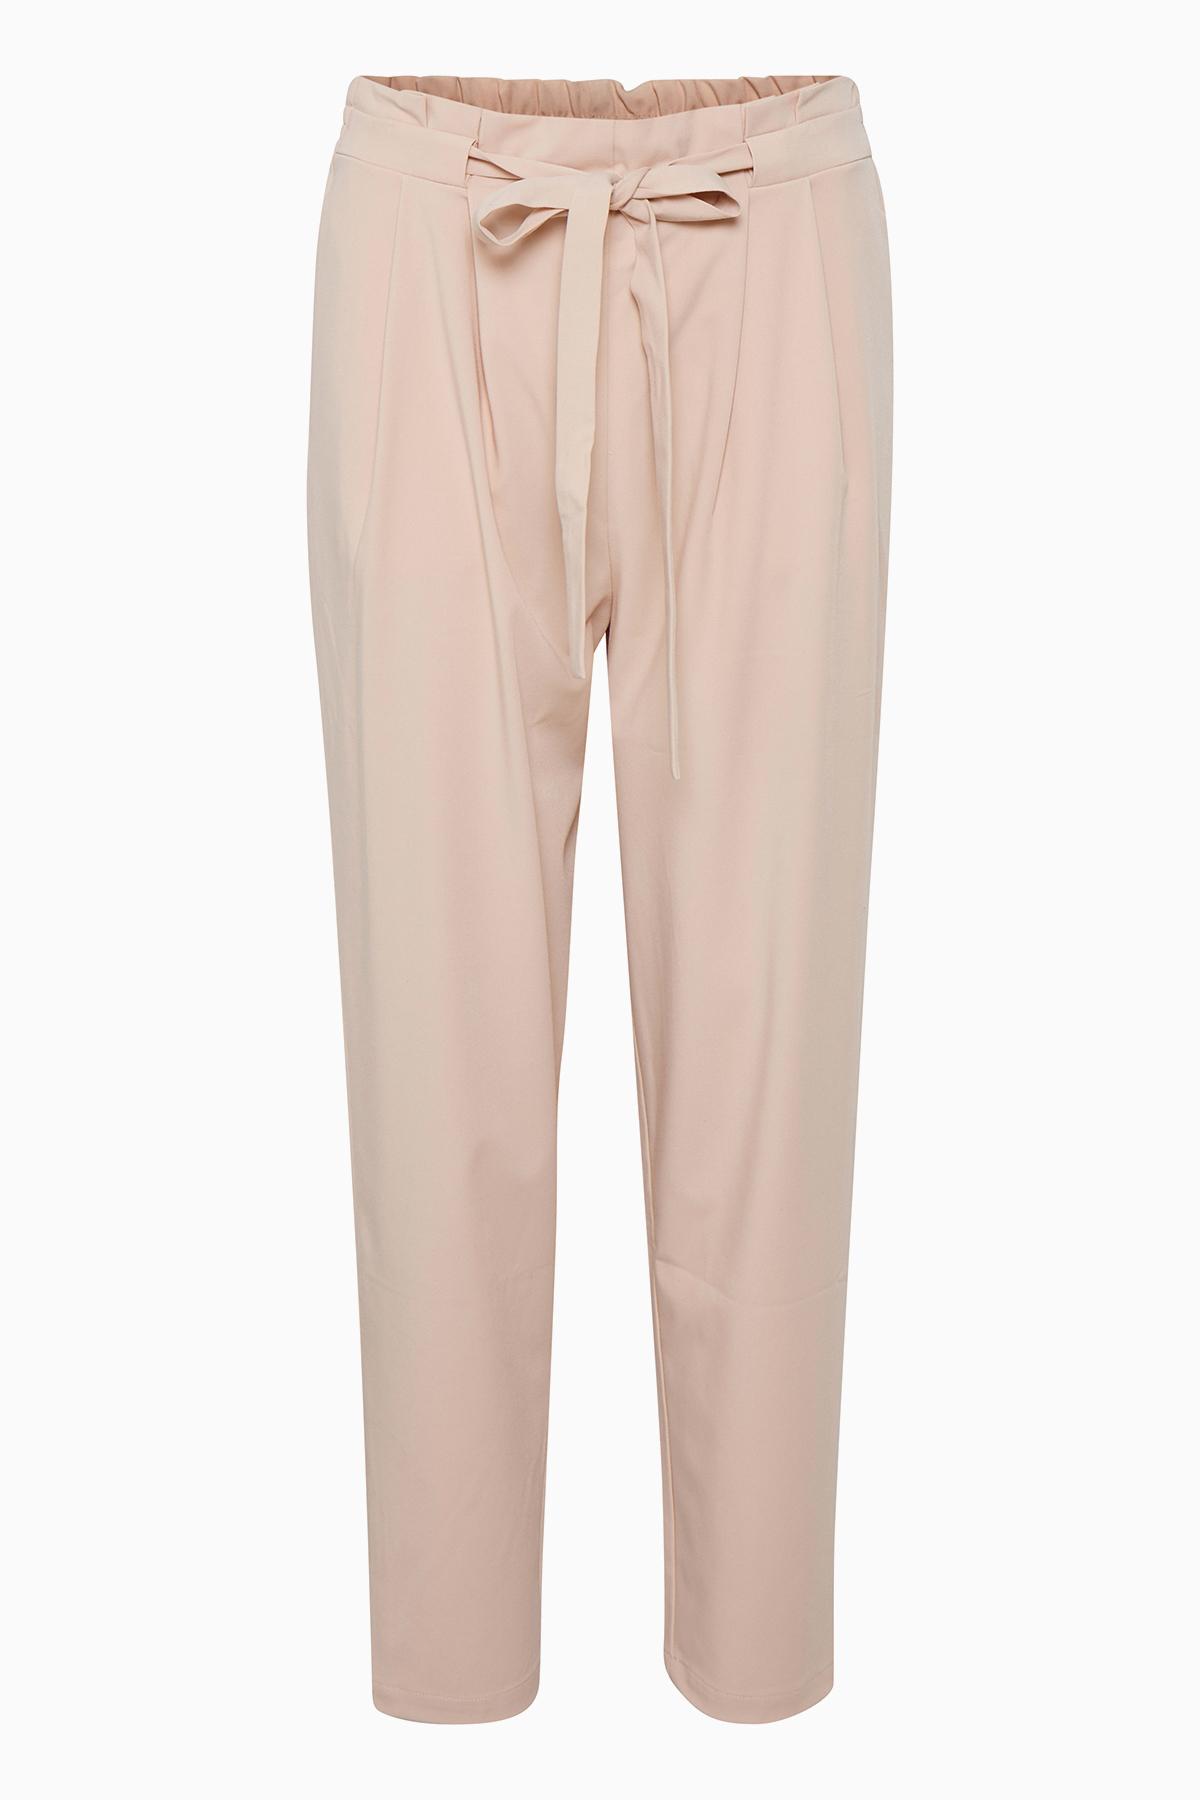 Cream Dame Enkelbroek - Misty roze